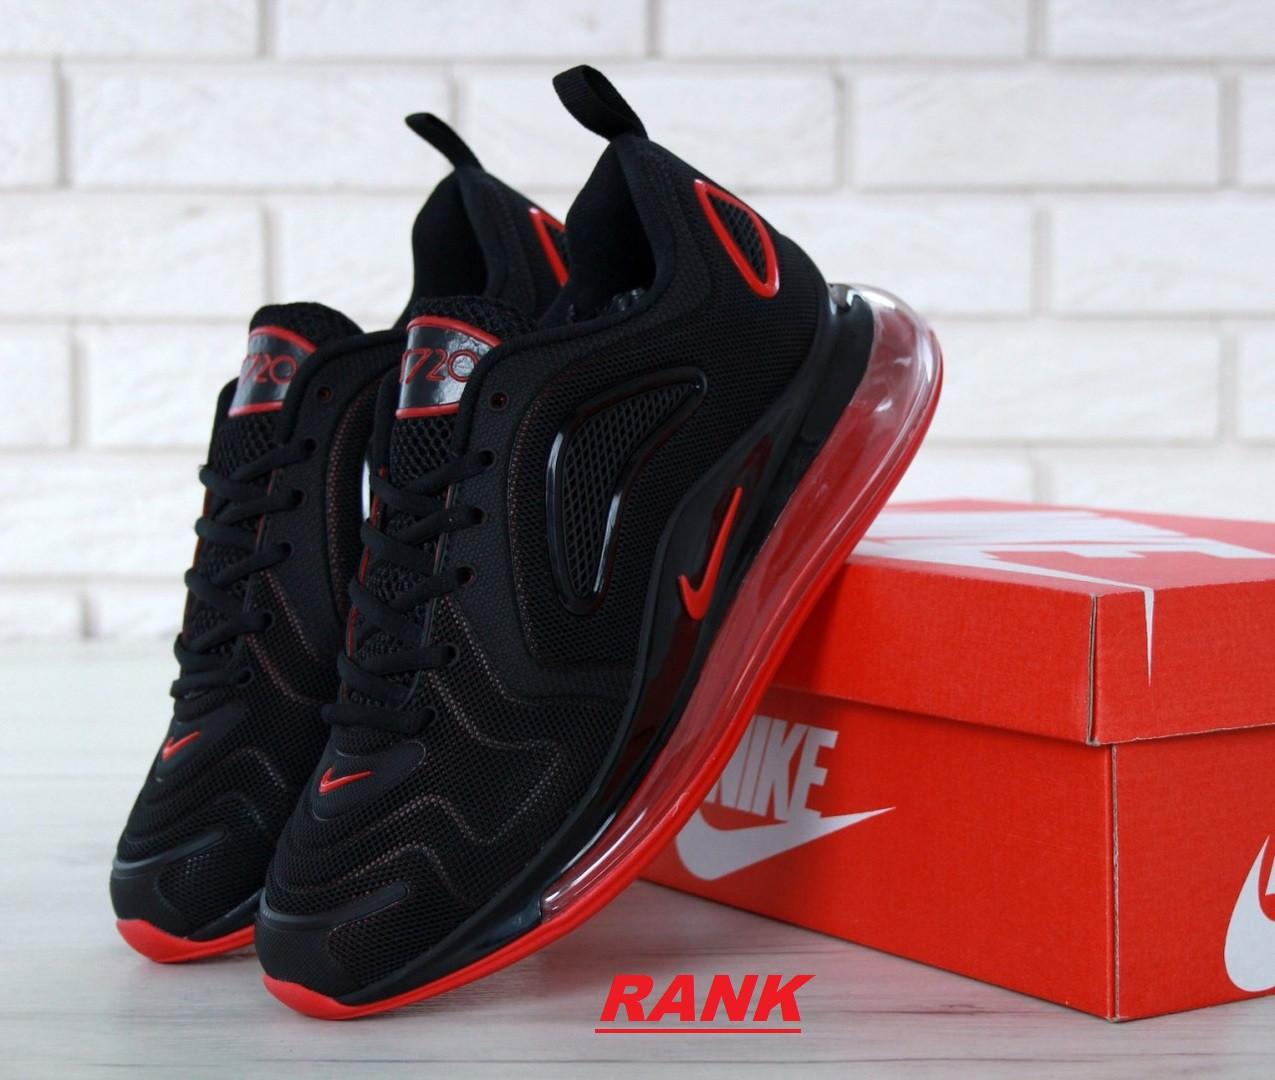 e4be6d27 Кроссовки мужские Nike Air Max 720 в стиле Найк Аир Макс 720, черные с  красной